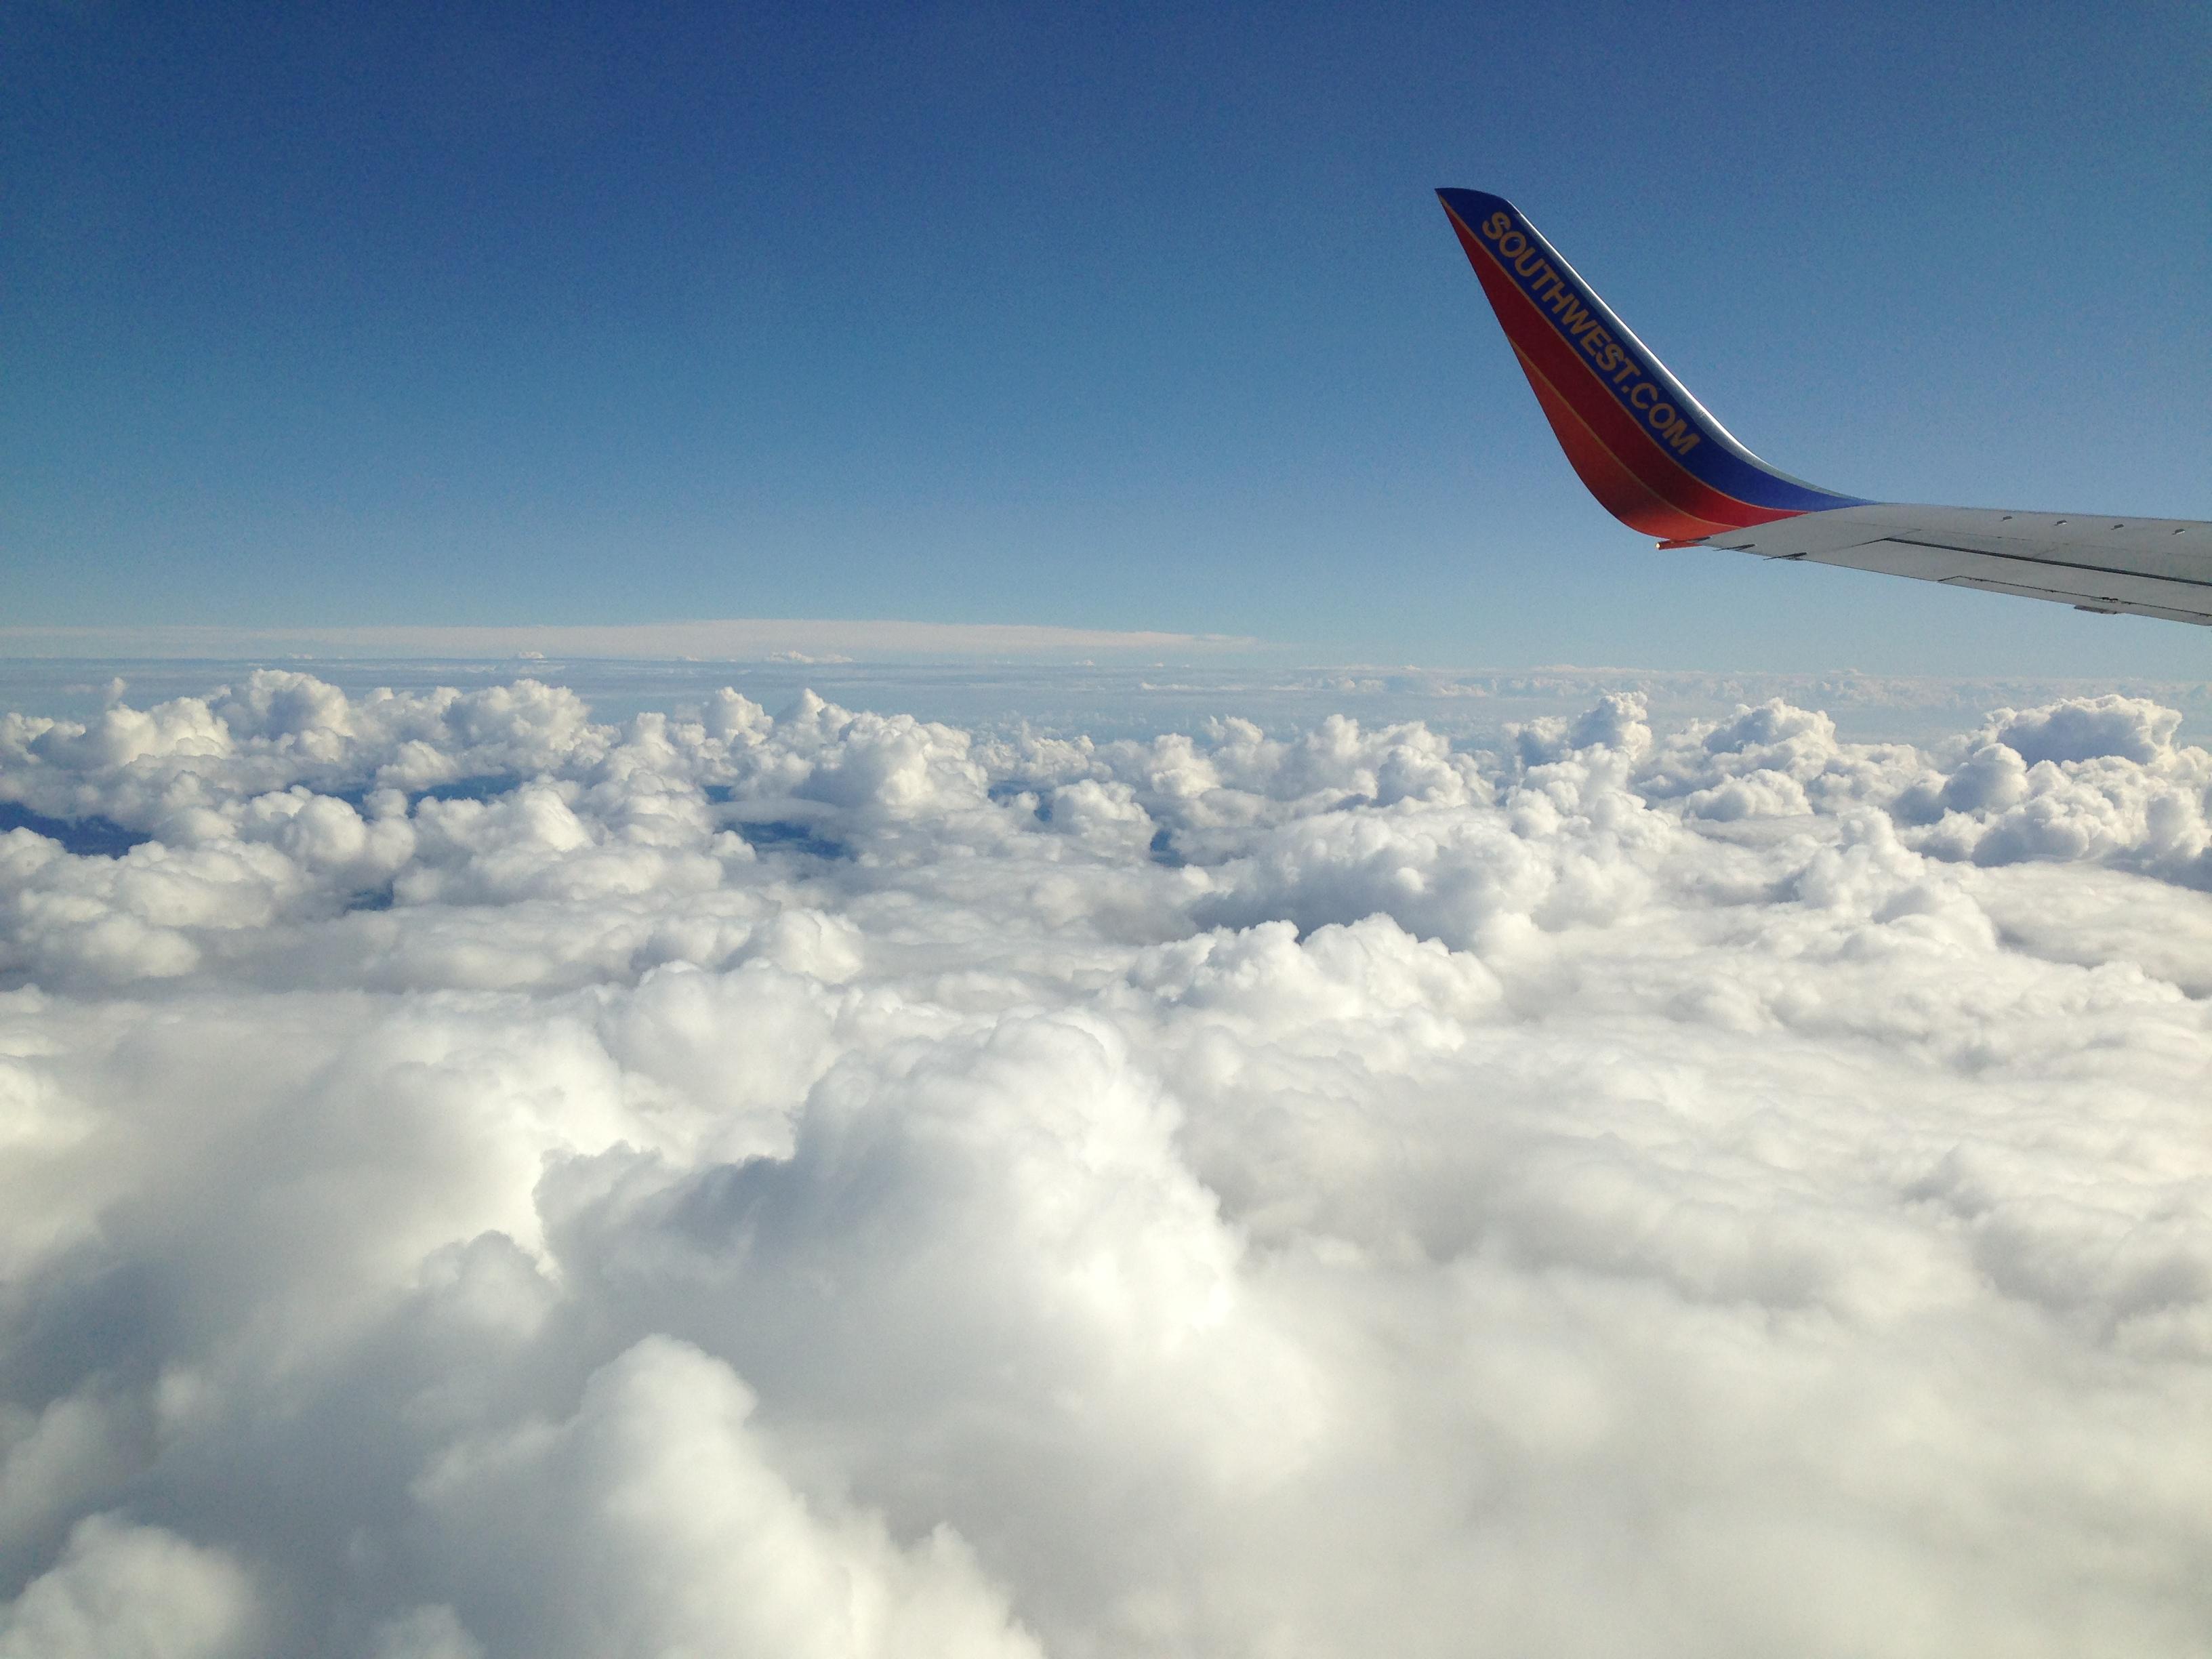 beautiful aircraft wallpaper view - photo #19